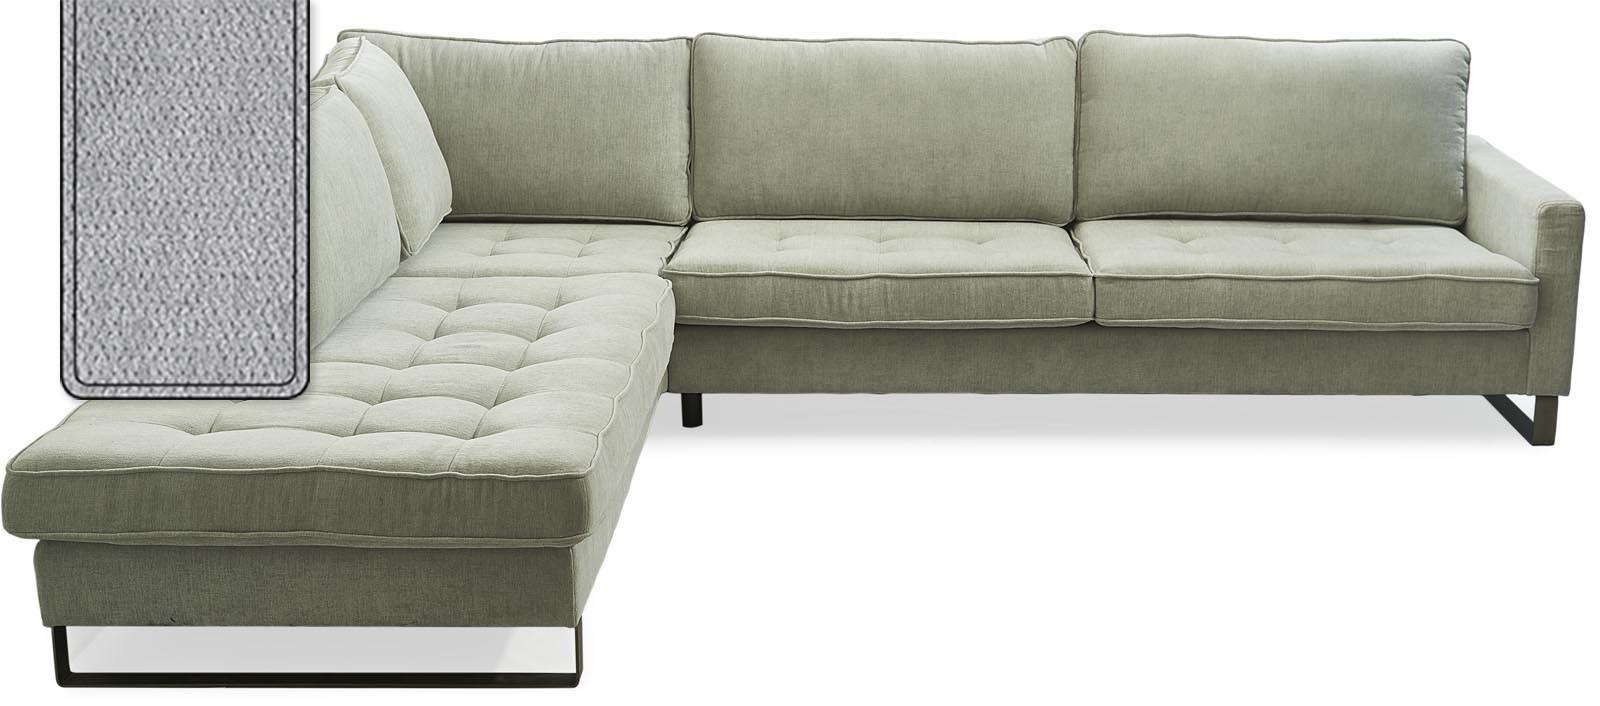 West Houston Corner Sofa Chaise Longue Left Polyster-Polyacryl Platinum / Rivièra Maison